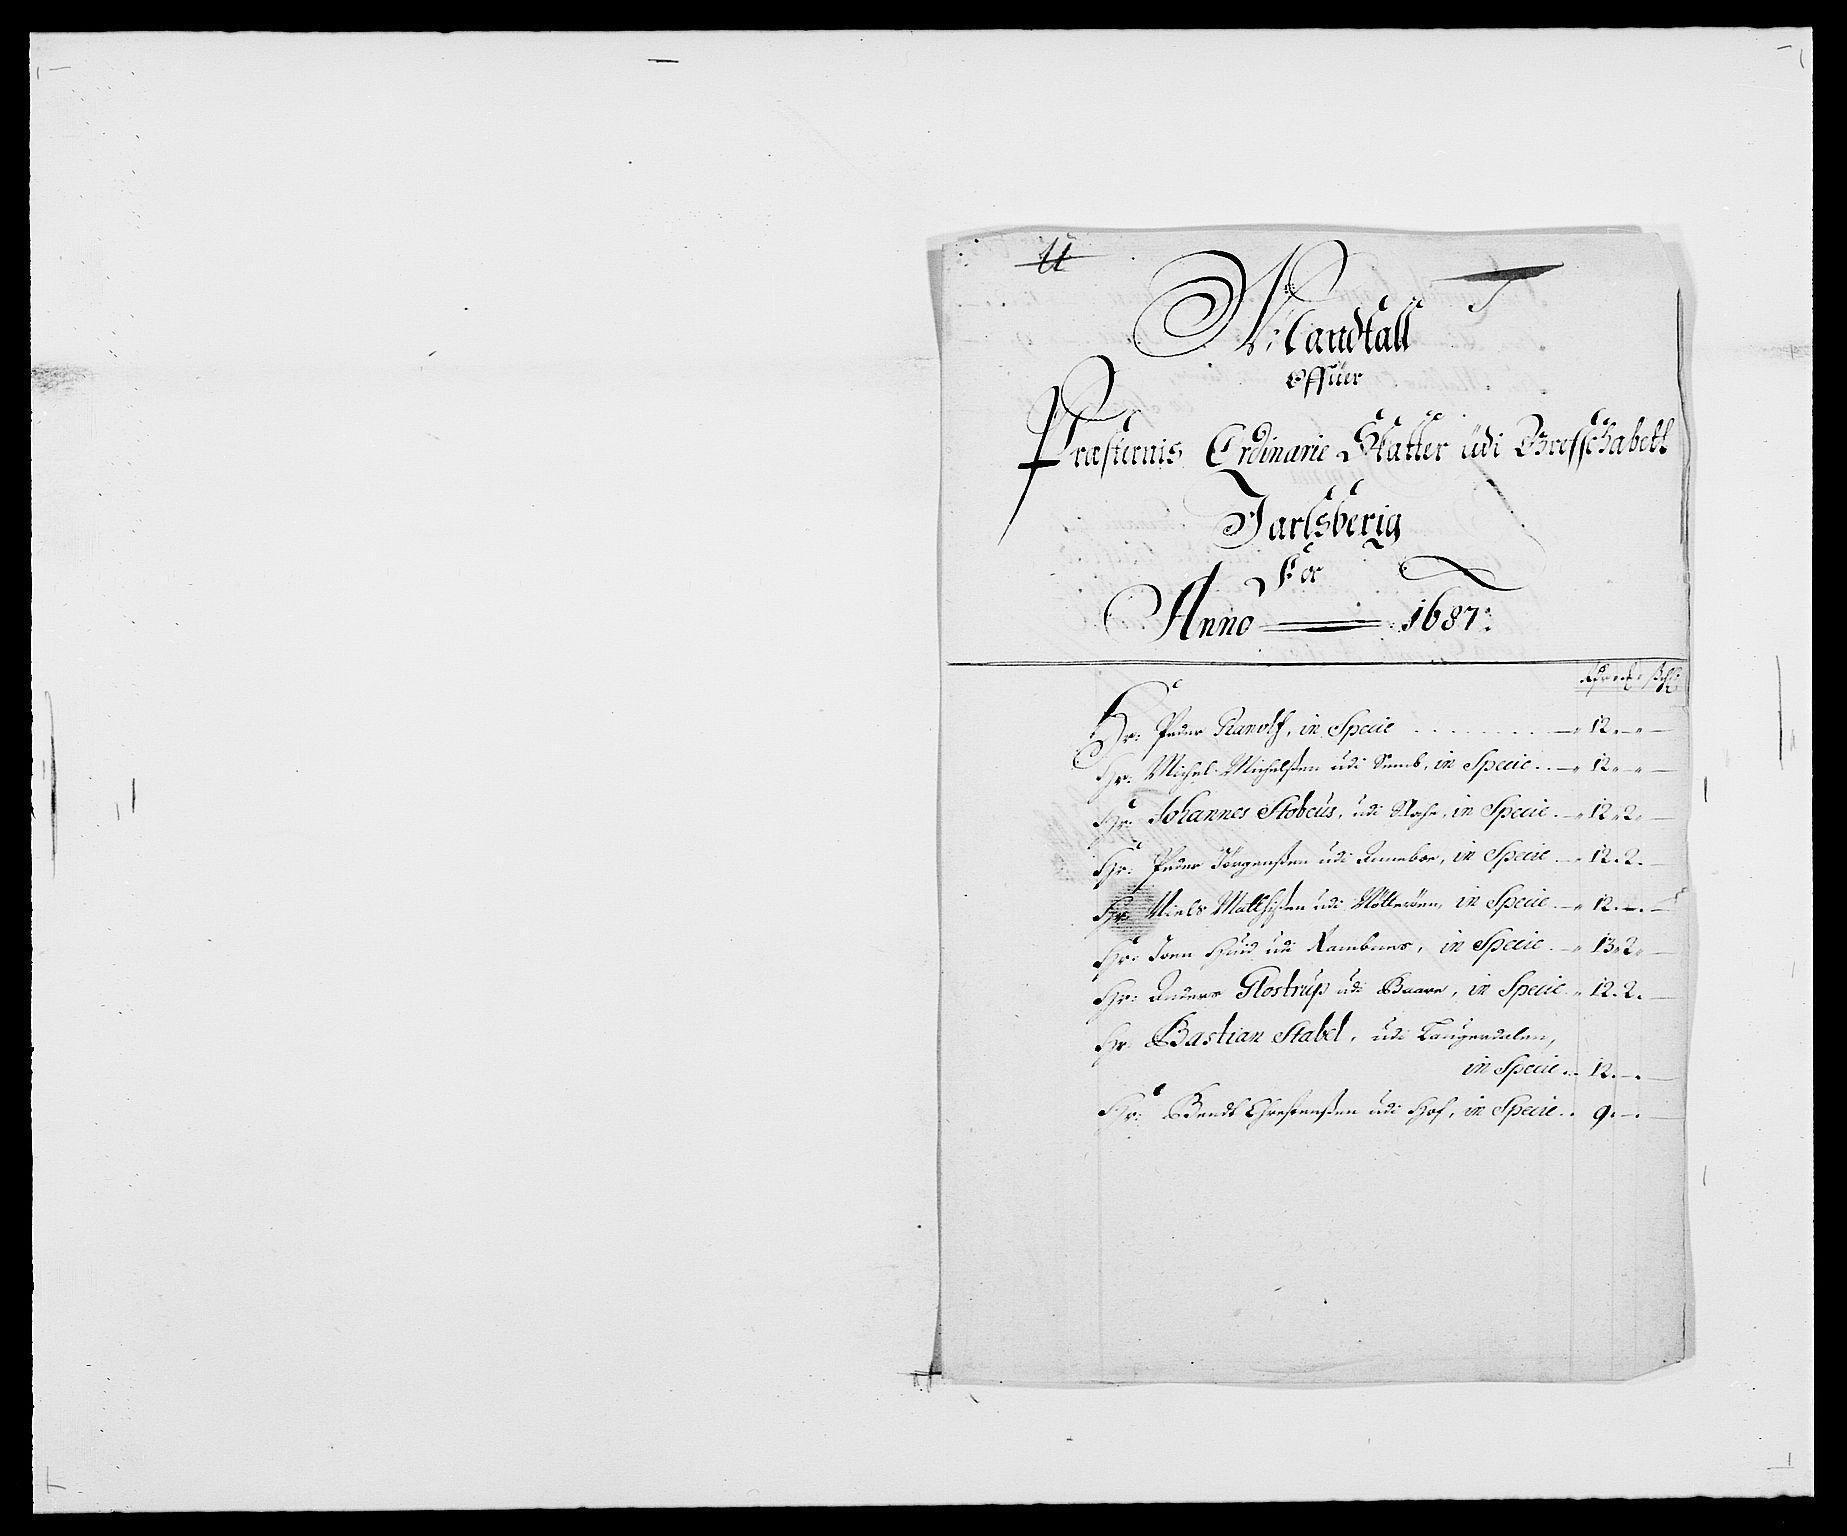 RA, Rentekammeret inntil 1814, Reviderte regnskaper, Fogderegnskap, R32/L1858: Fogderegnskap Jarlsberg grevskap, 1686-1690, s. 329